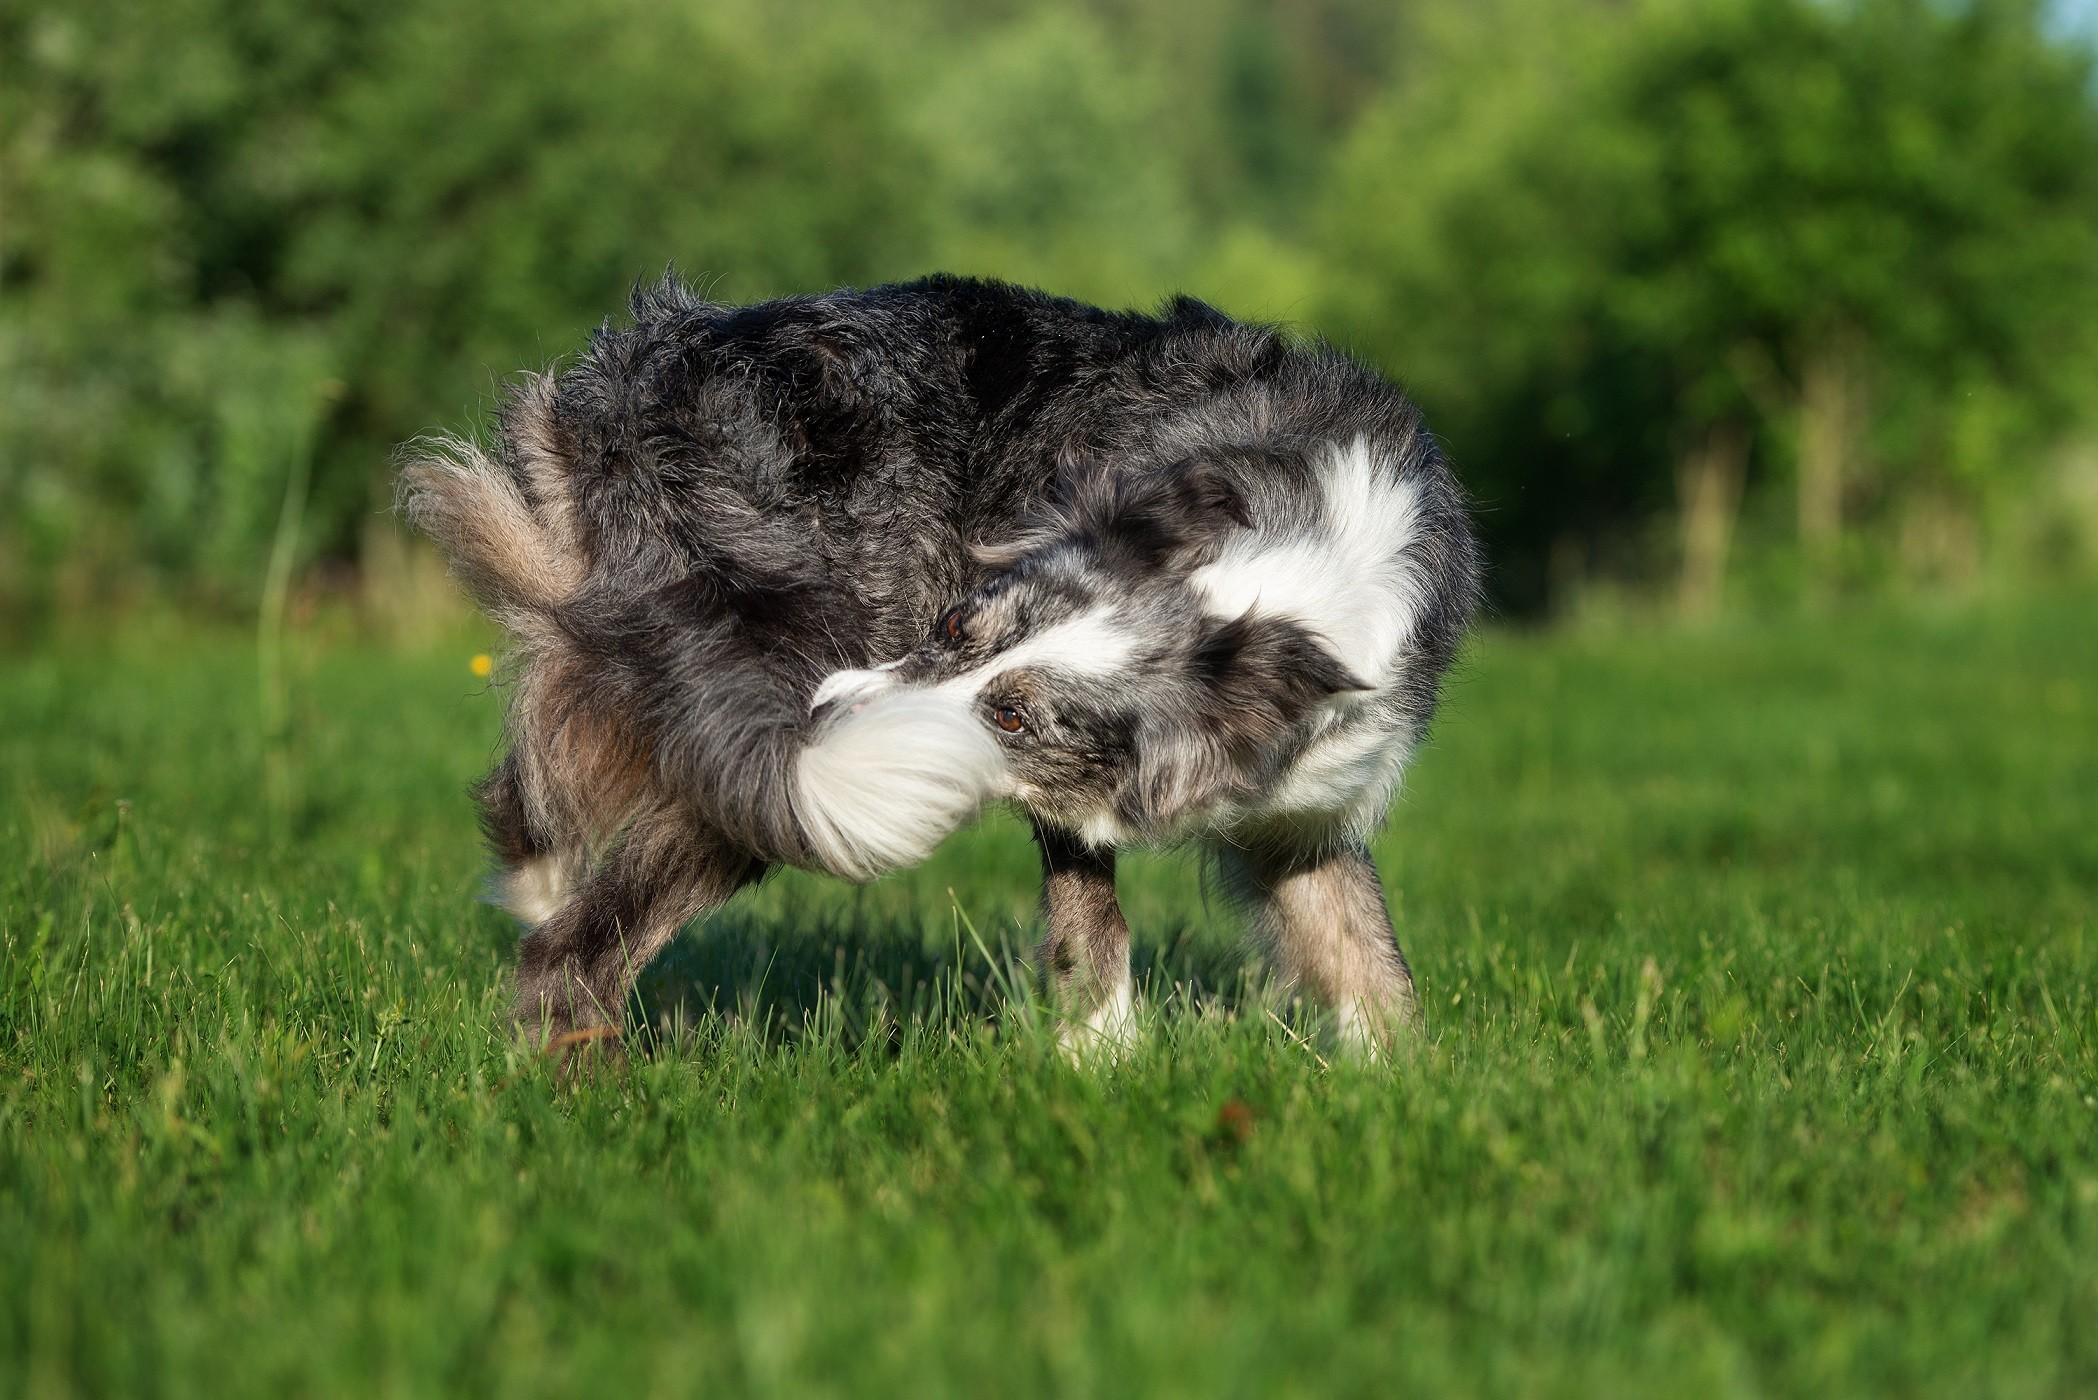 dog chasing his tail